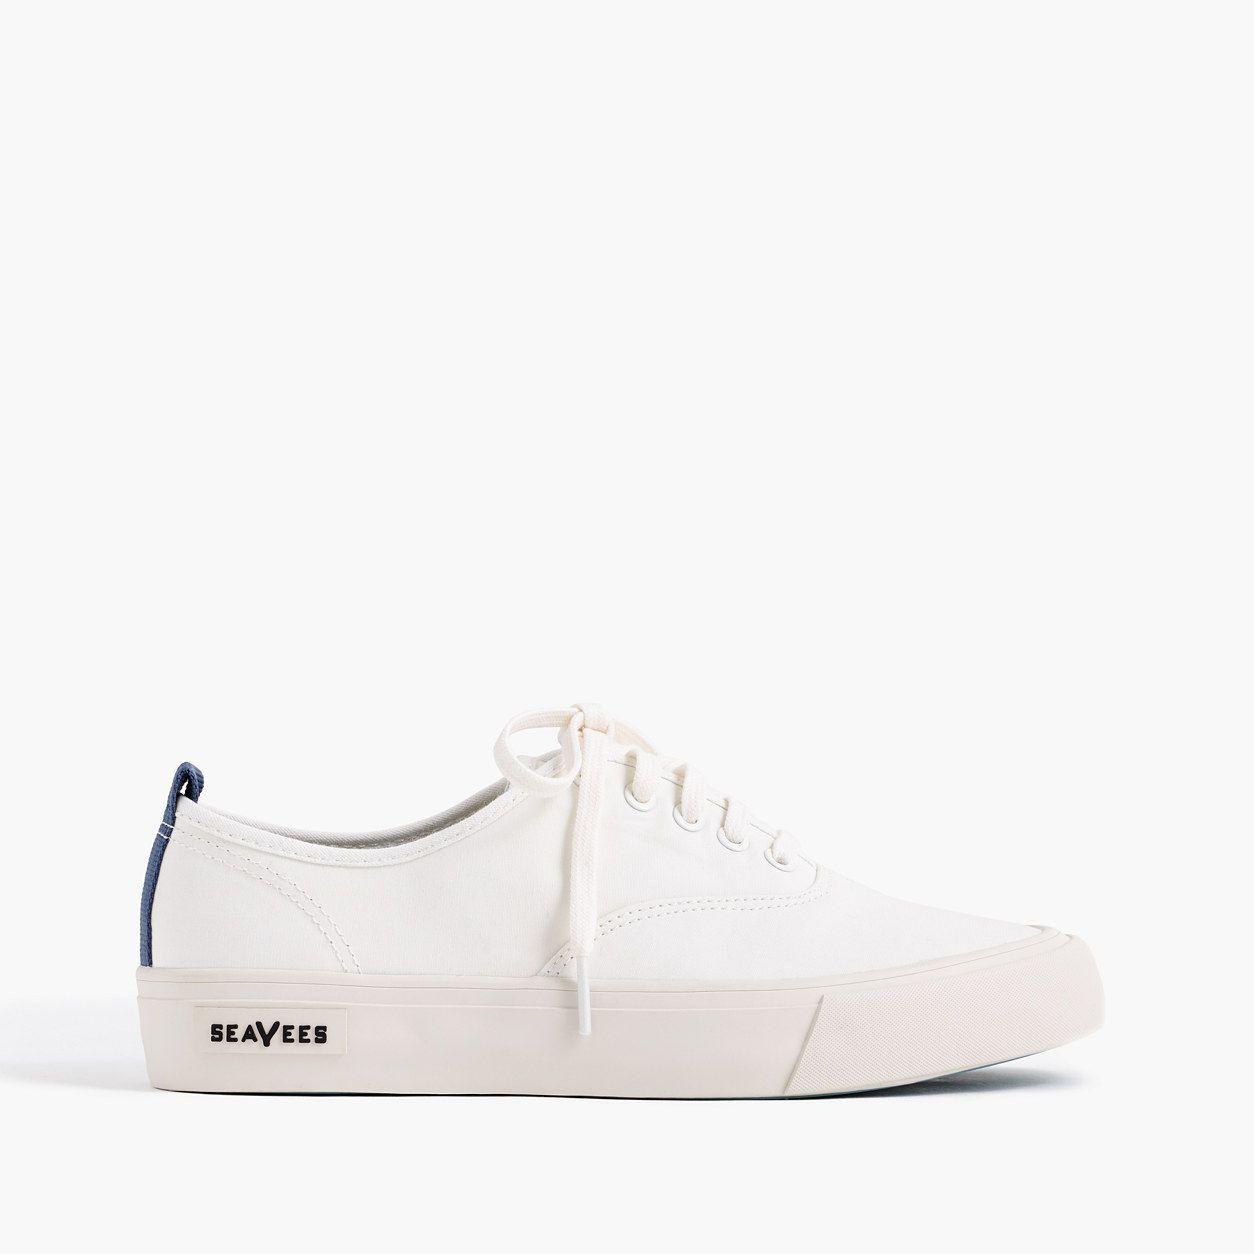 SeaVees® for J.Crew Legend sneakers in piqué cotton for sale official site PbVluIG4J